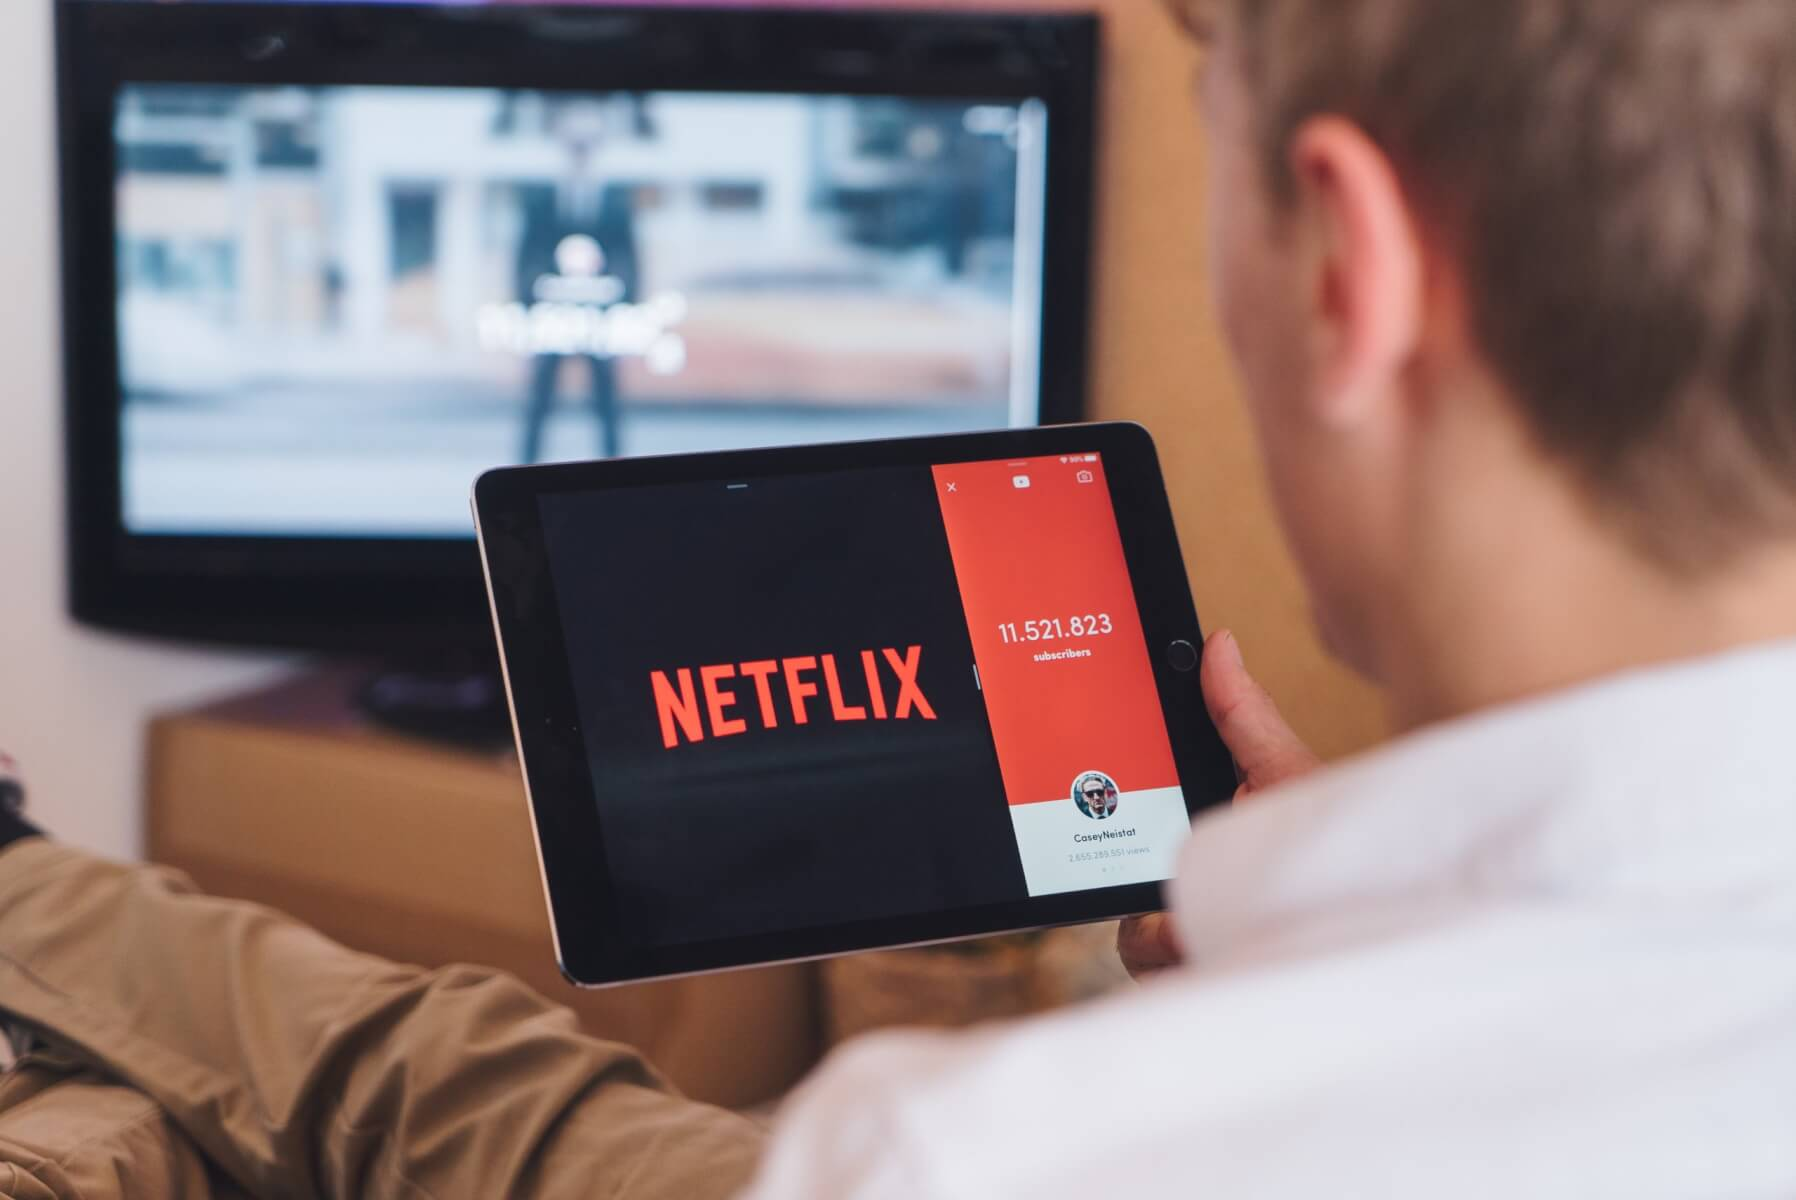 Netflix Will Cancel Inactive Memberships